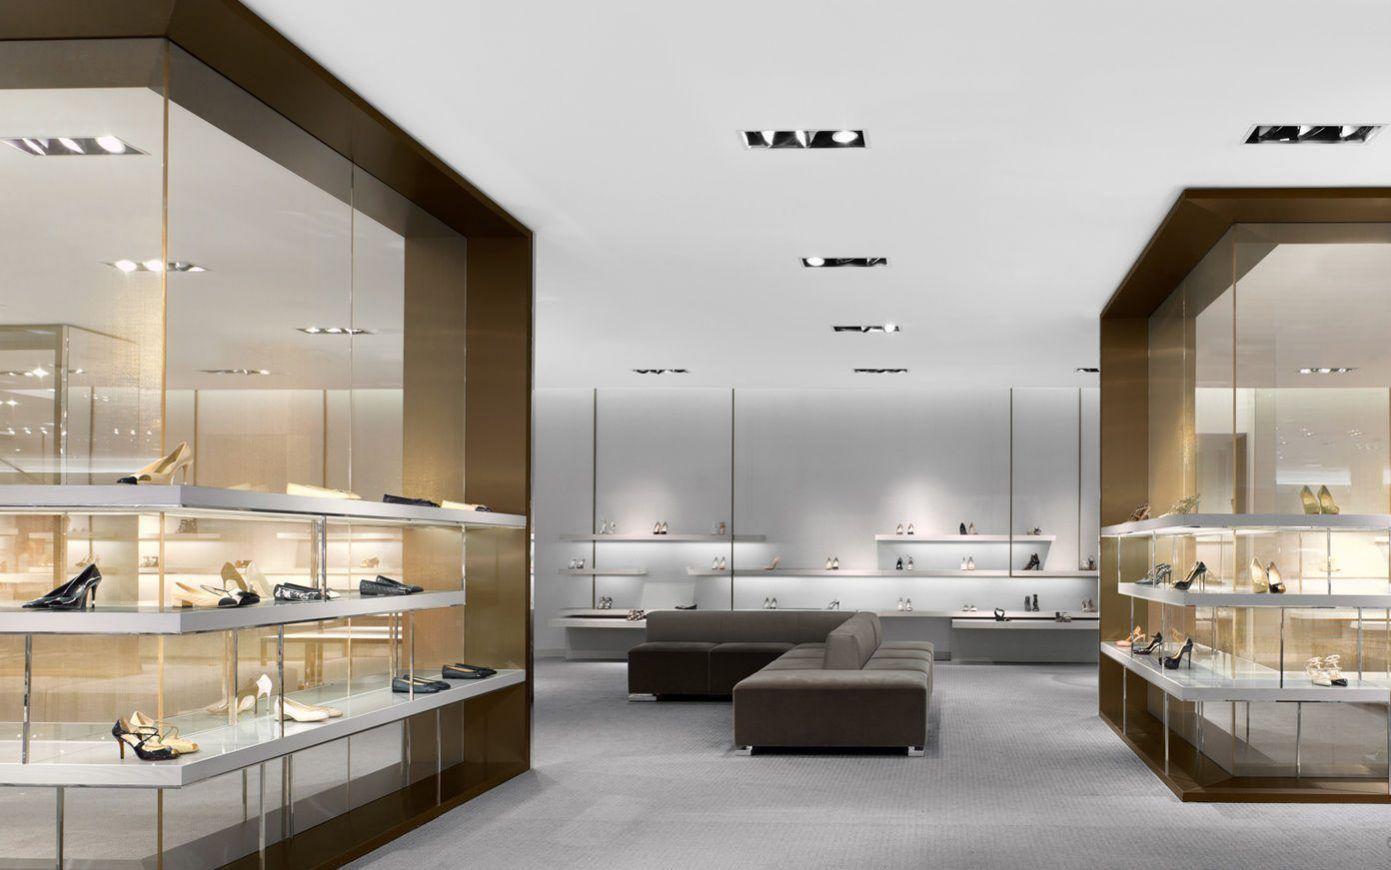 Wooden Footwear Store Design Showcase Display Furniture Boutique